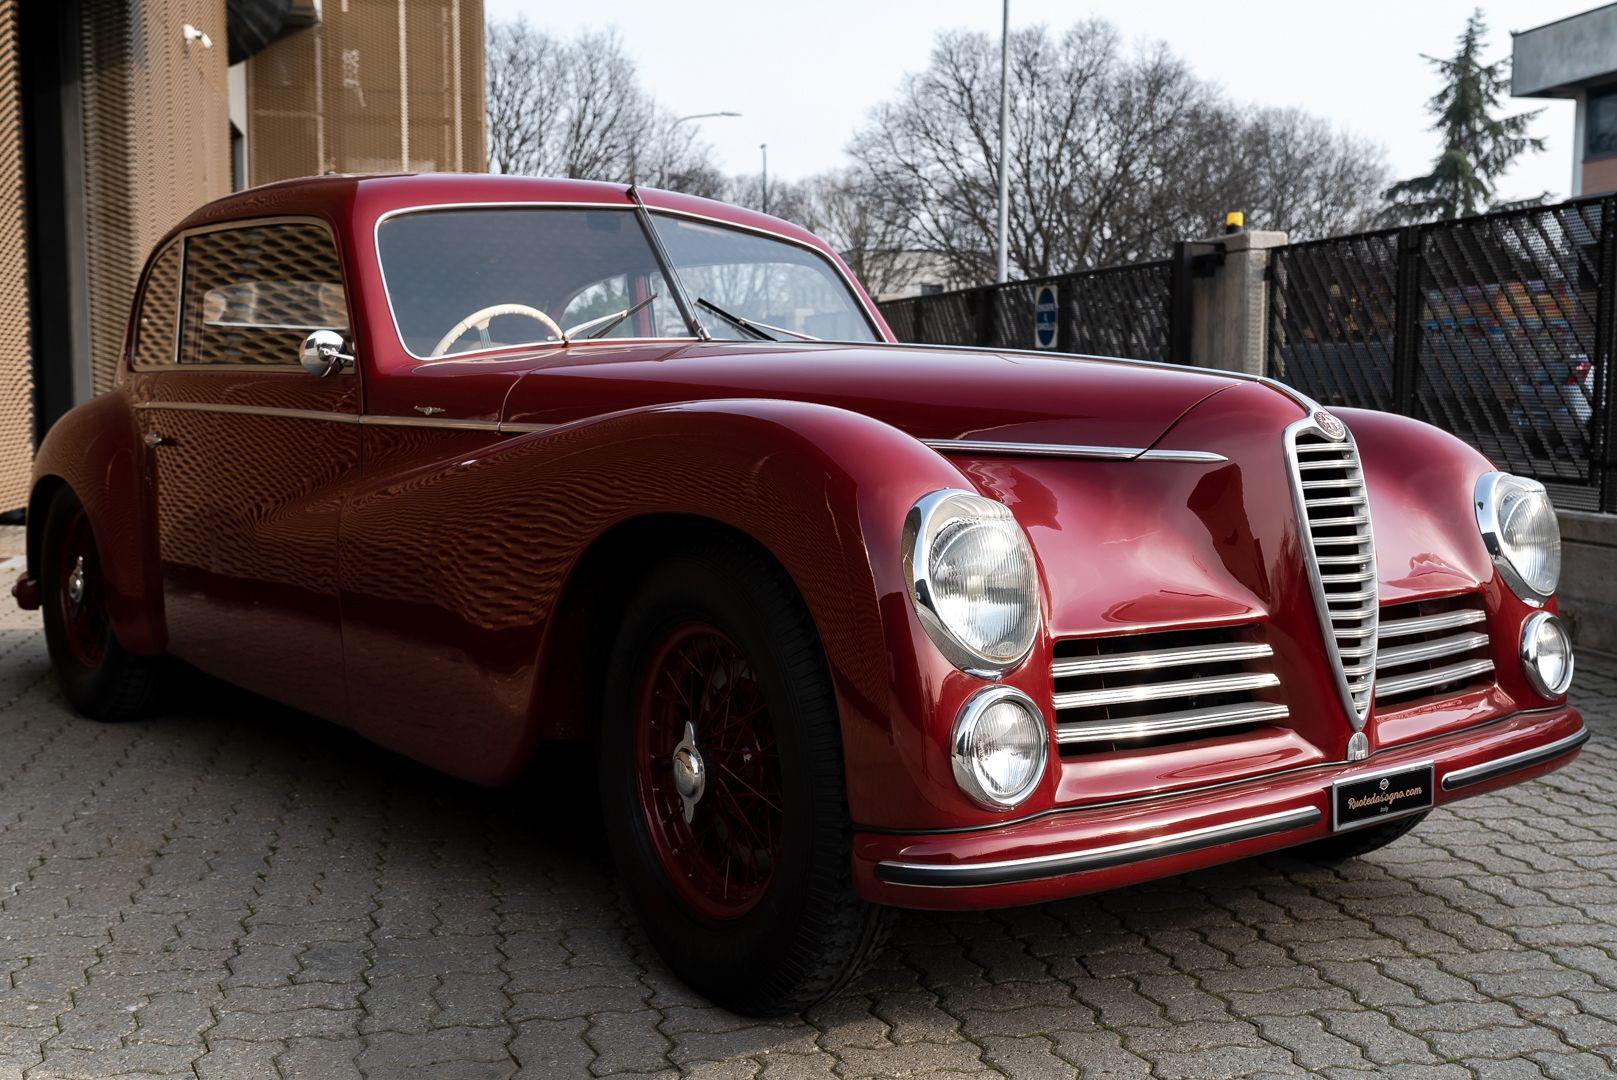 1947 Alfa Romeo Freccia d'oro 6C 2500 Sport 61700